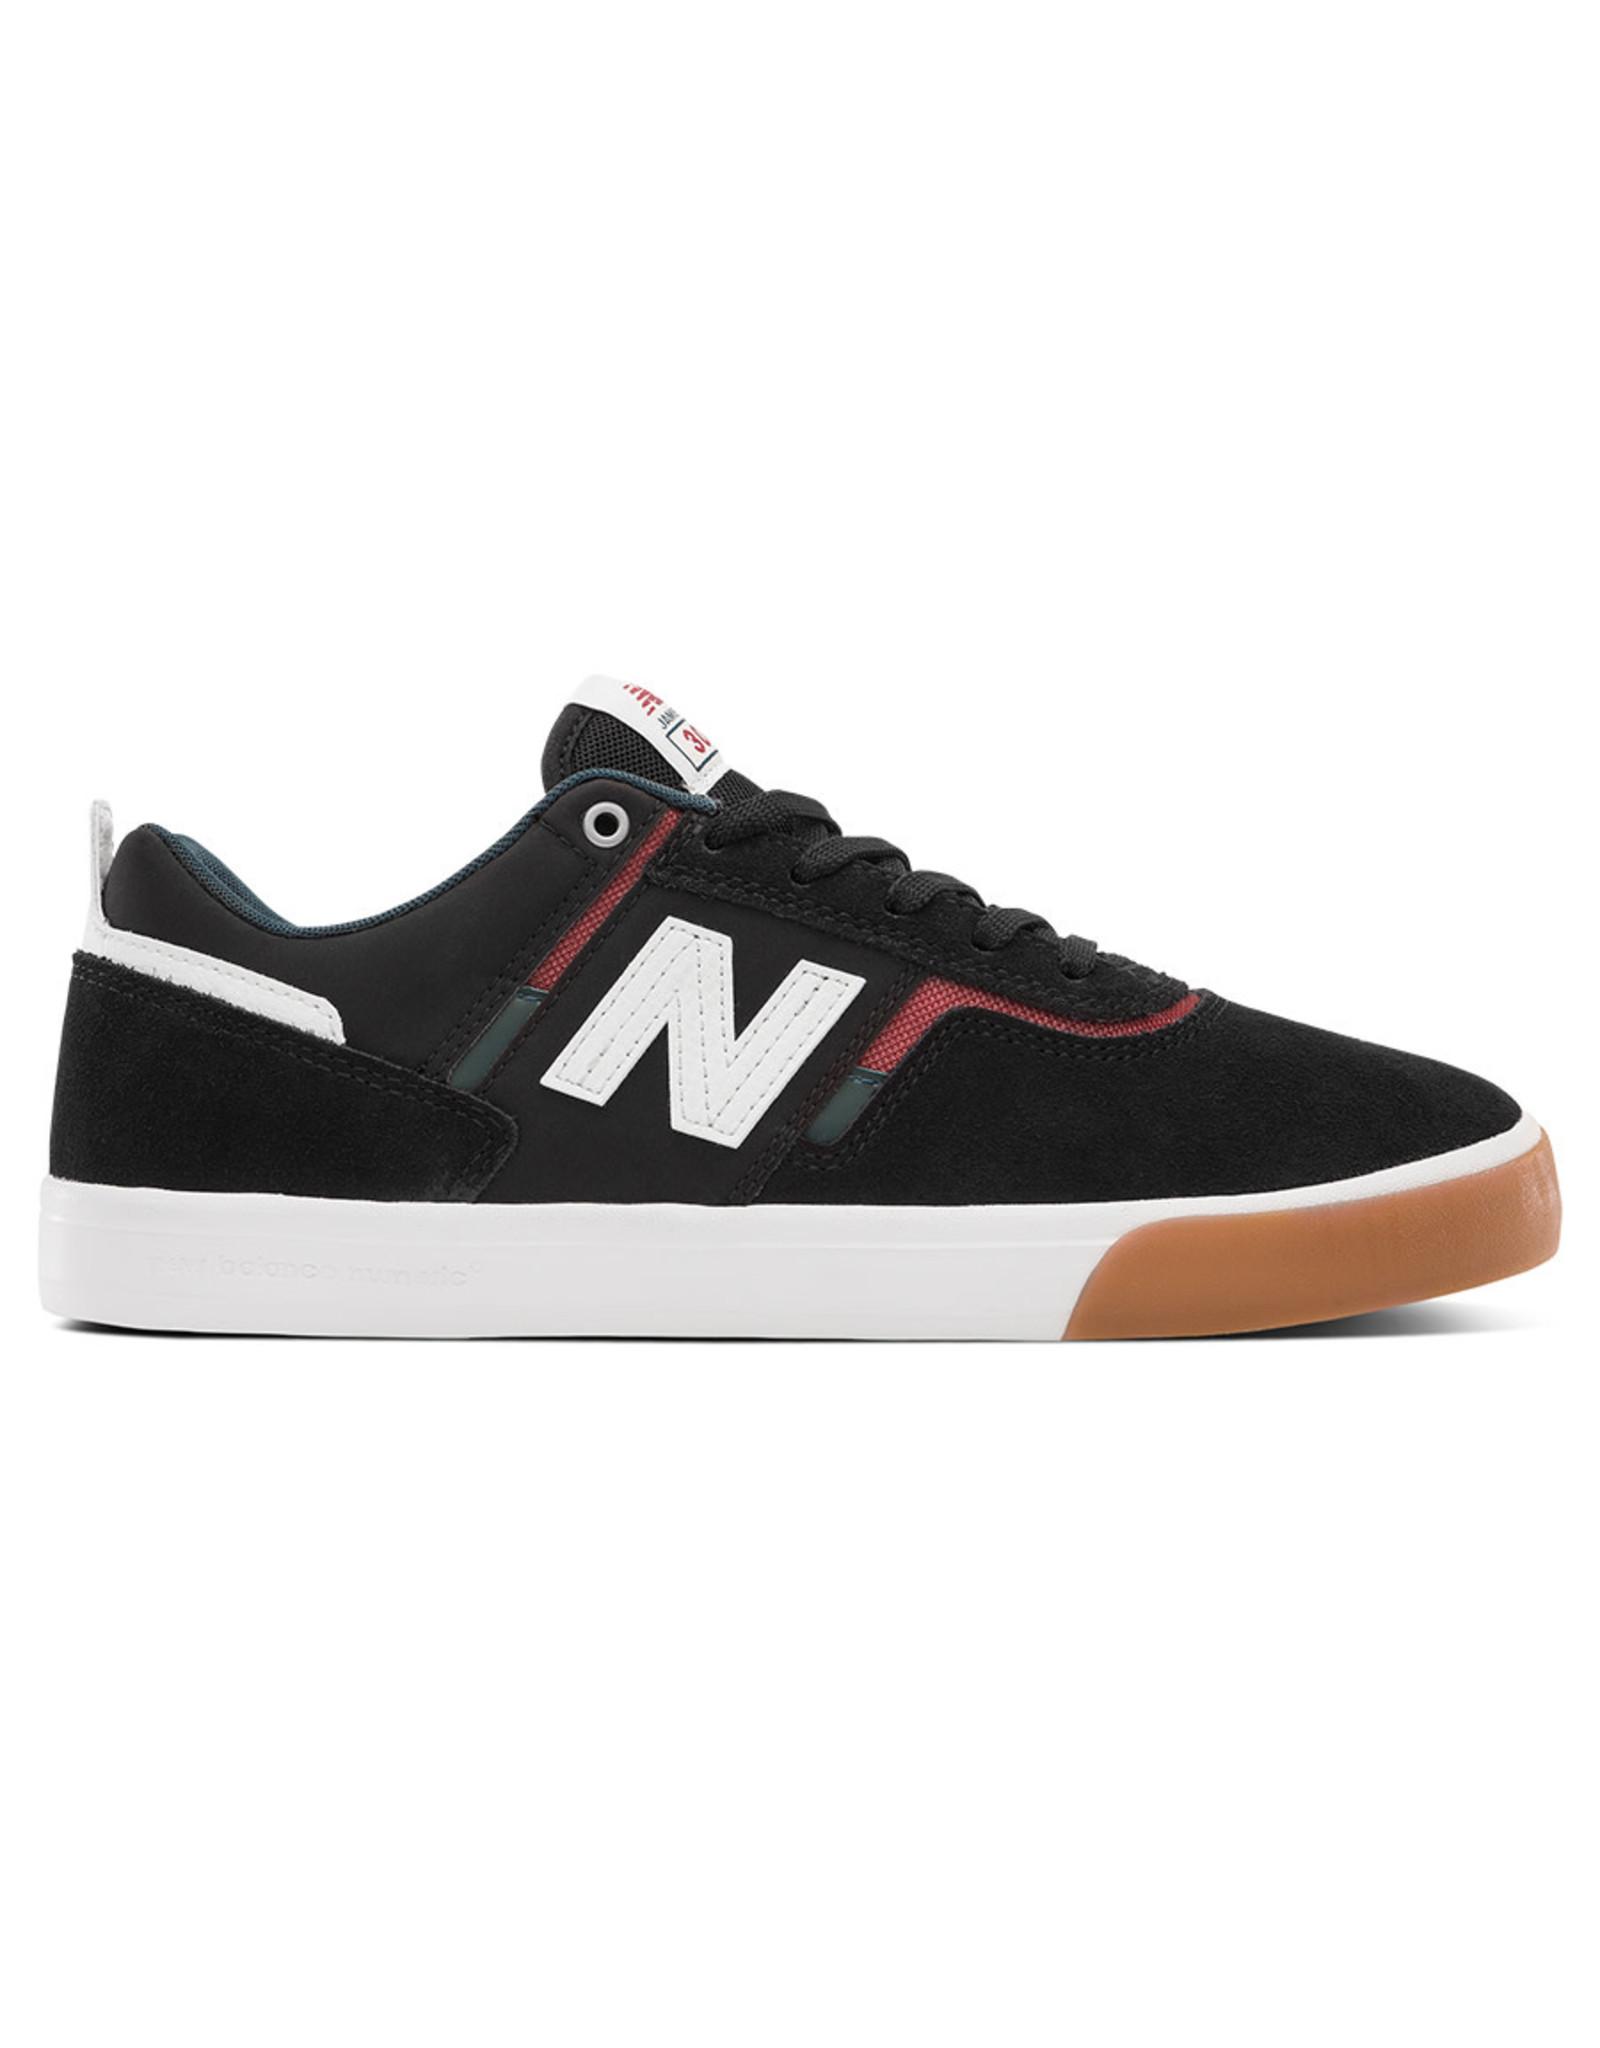 New Balance Numeric New Balance Numeric Shoe 306 Jamie Foy (Black/Forest/Red)